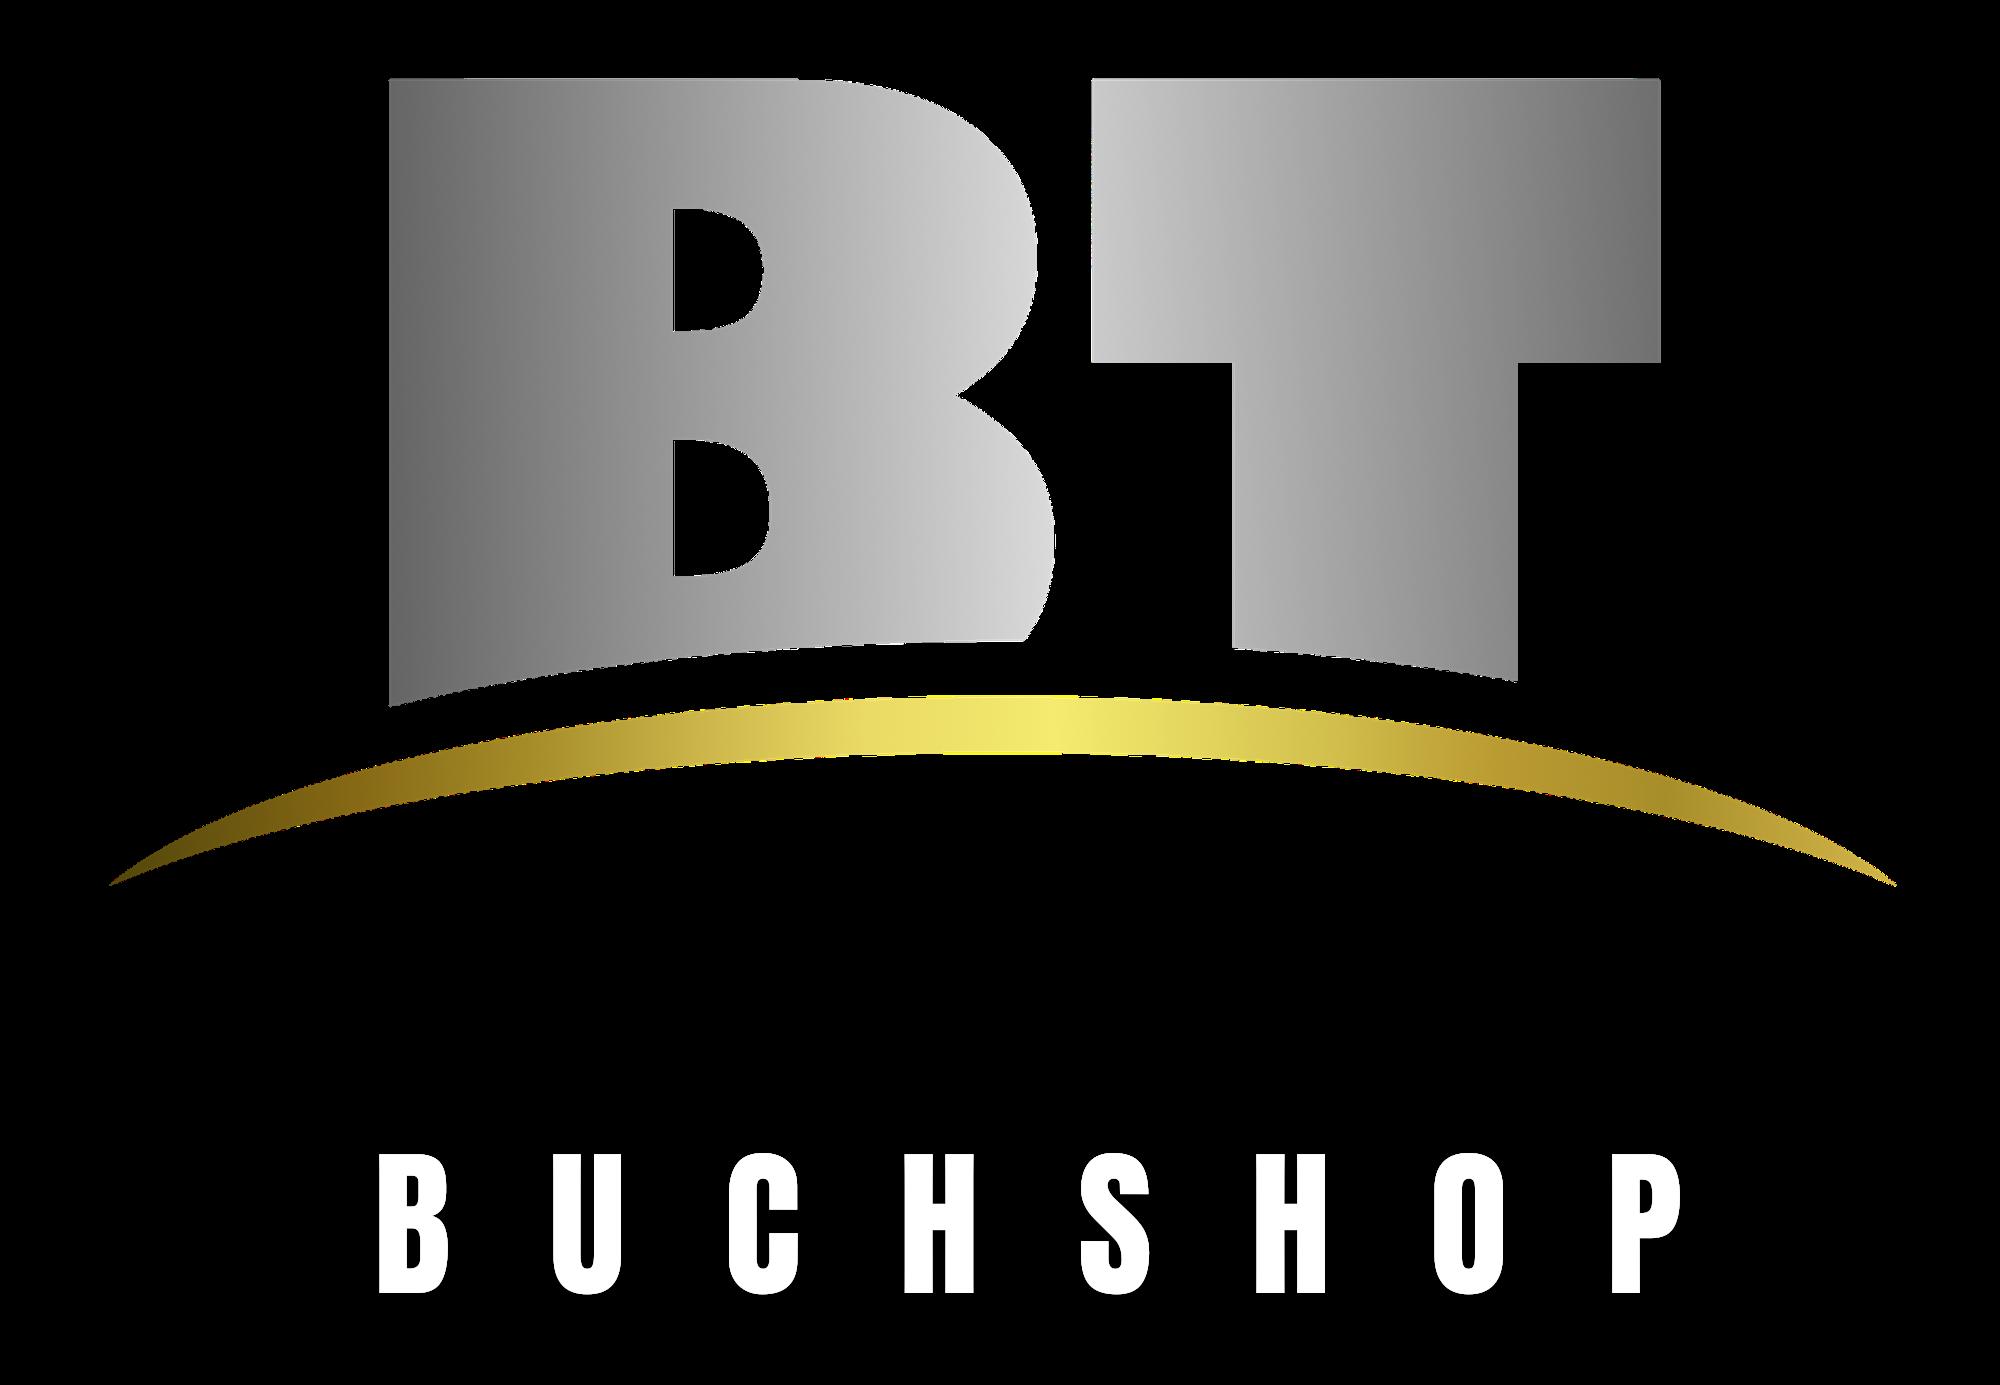 BT MEDIA BUCHSHOP